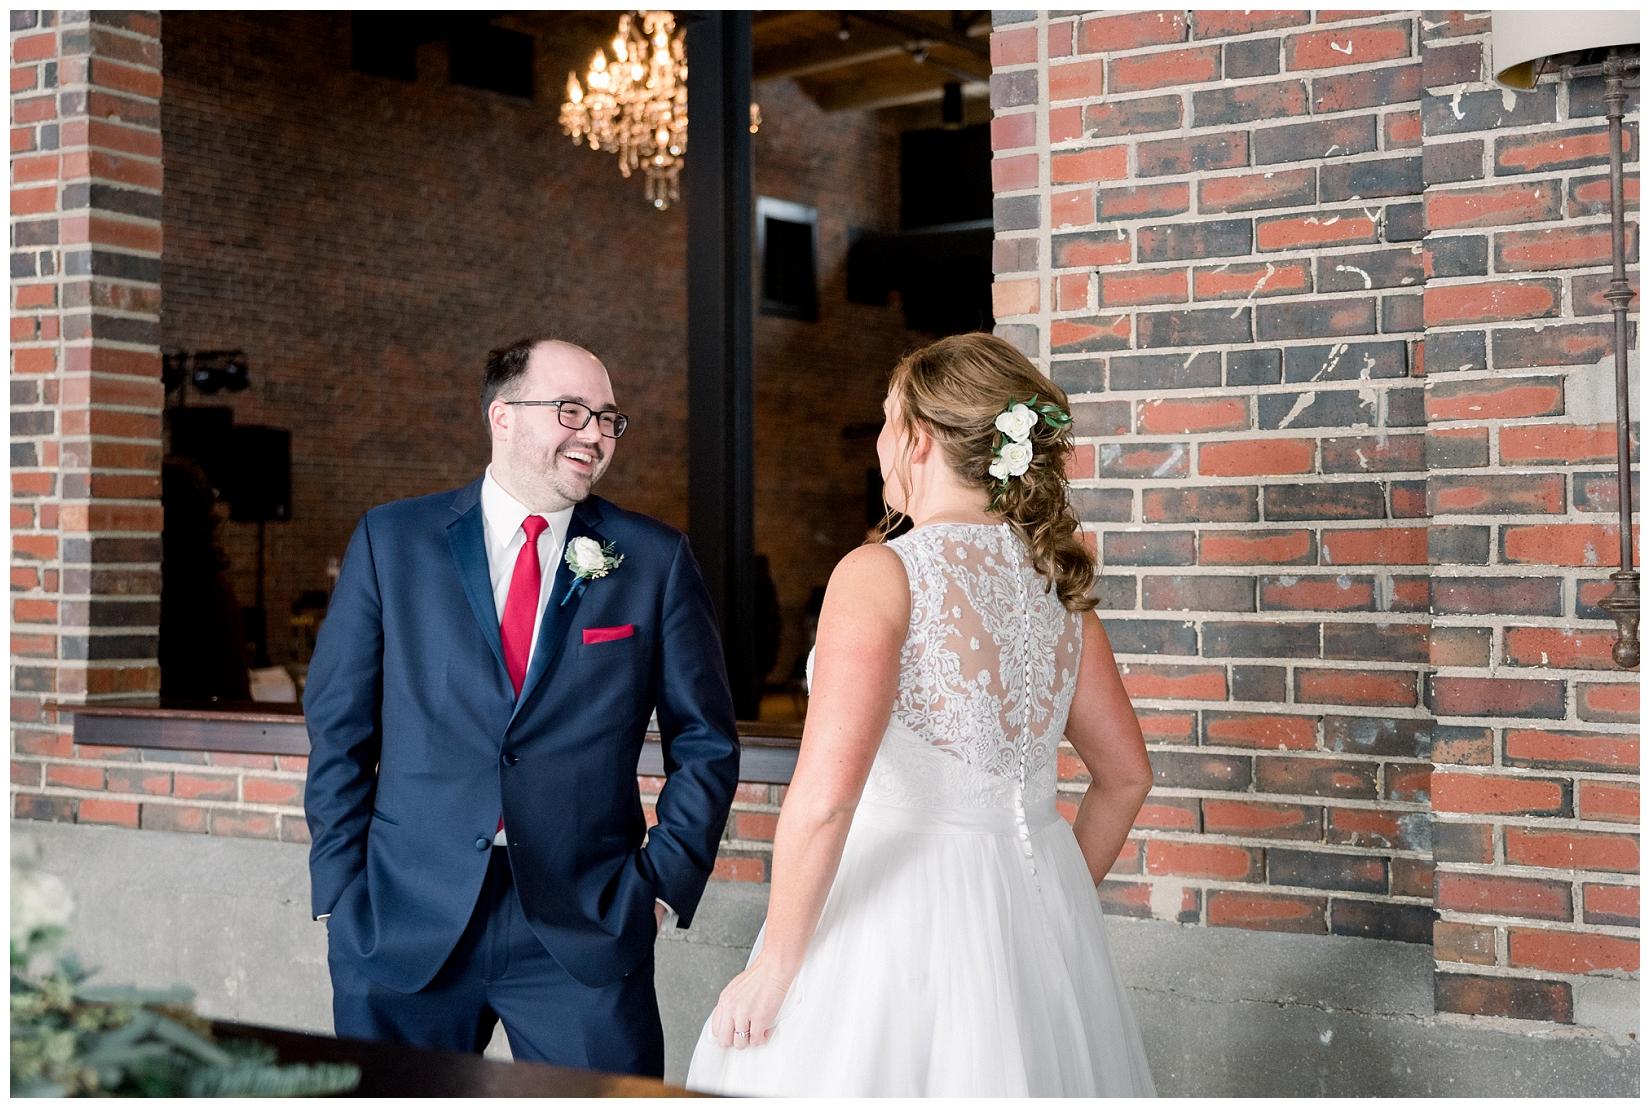 cat-alkire-wedding-photographer-indiana-chicago-indianapolis-fort-wayne_0937.jpg